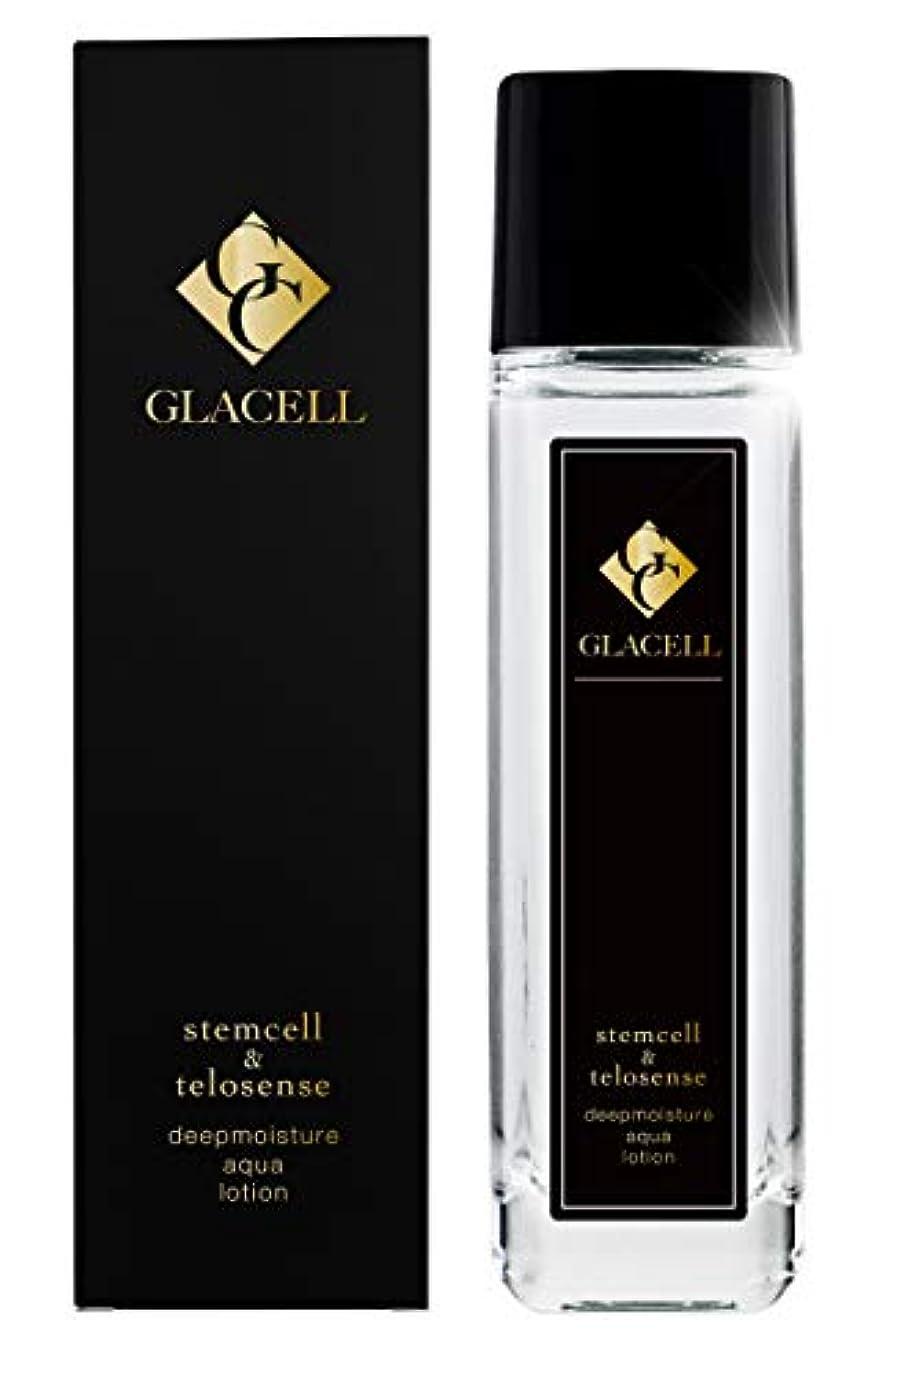 GLACELL グラセル ディープモイスチャーローション 【ノーベル生理学医学賞】受賞 高保湿成分 「アクアキシル配合」高級化粧水